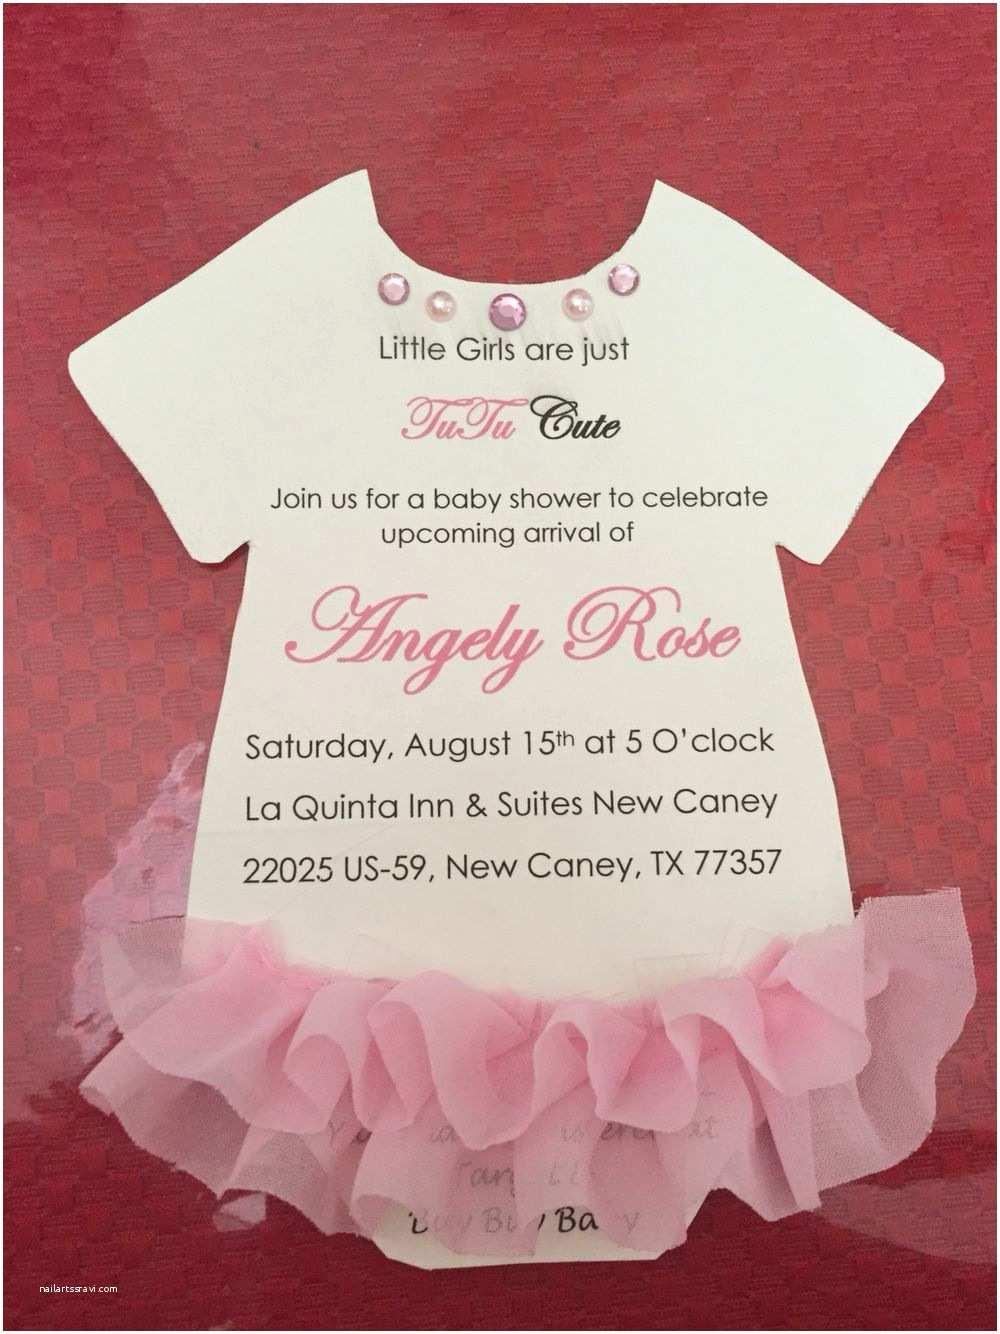 Baby Shower Invitations for Girls Baby Shower for Girls Tutu Baby Shower Pink Invitations